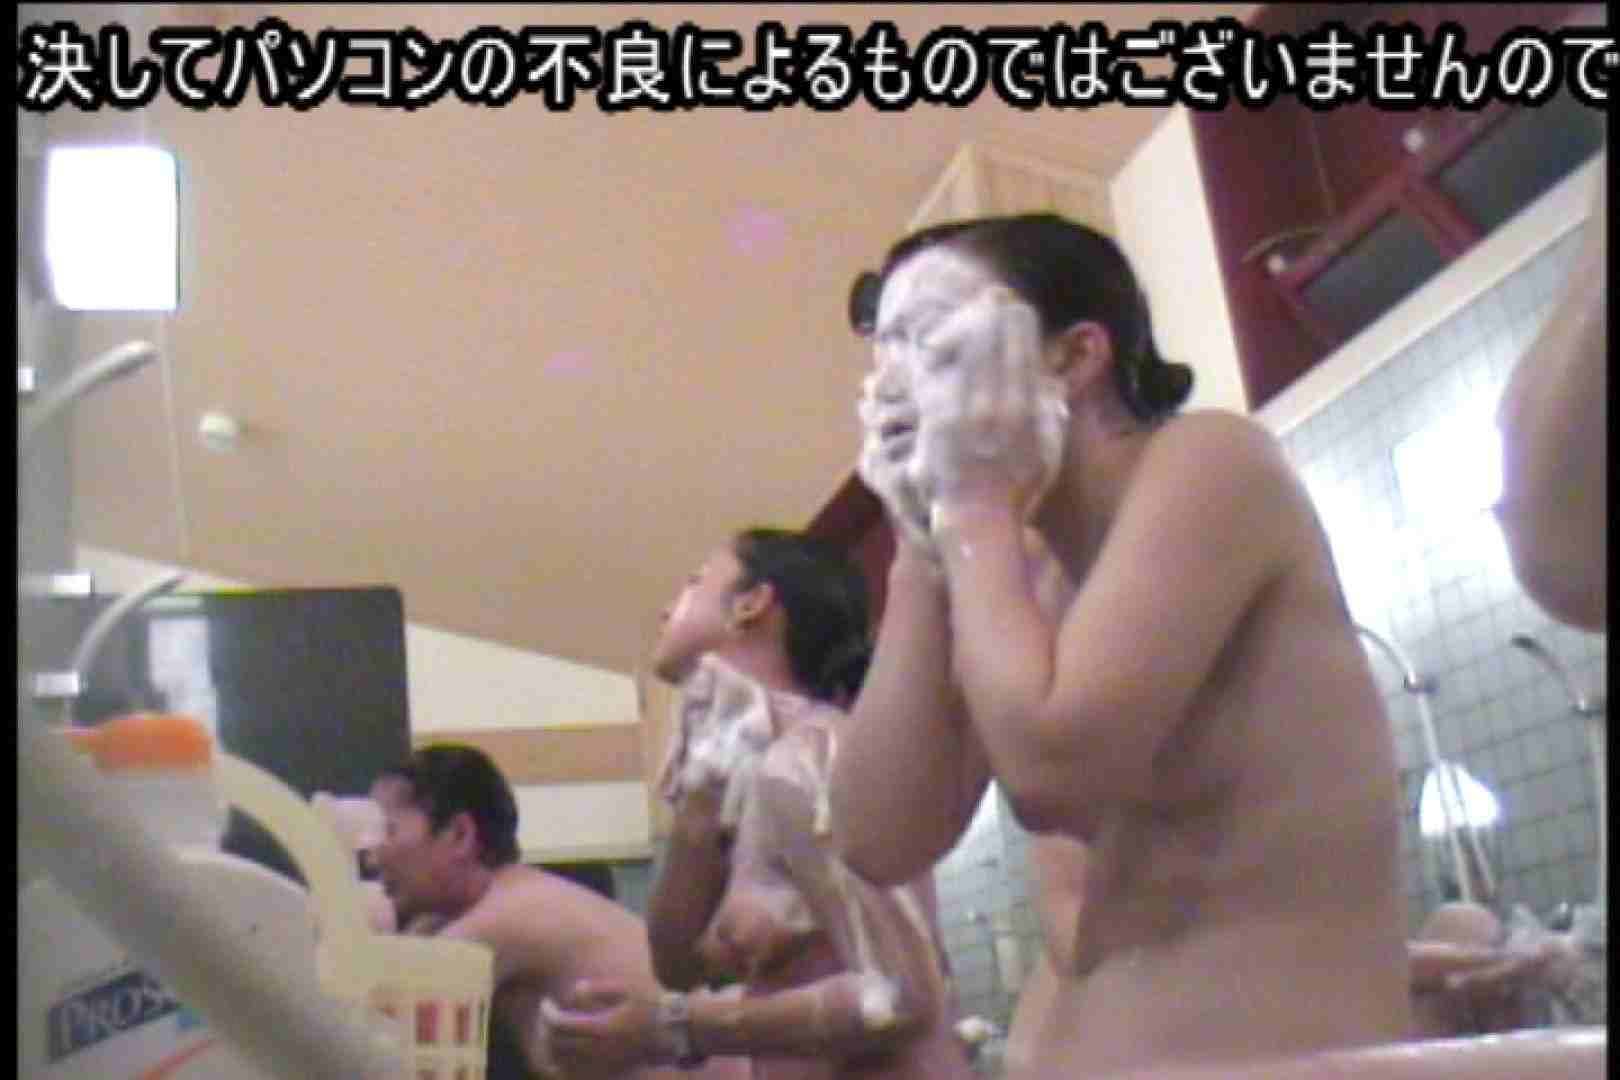 厳選 潜入女風呂 No.7 脱衣所の着替え   潜入  86画像 1